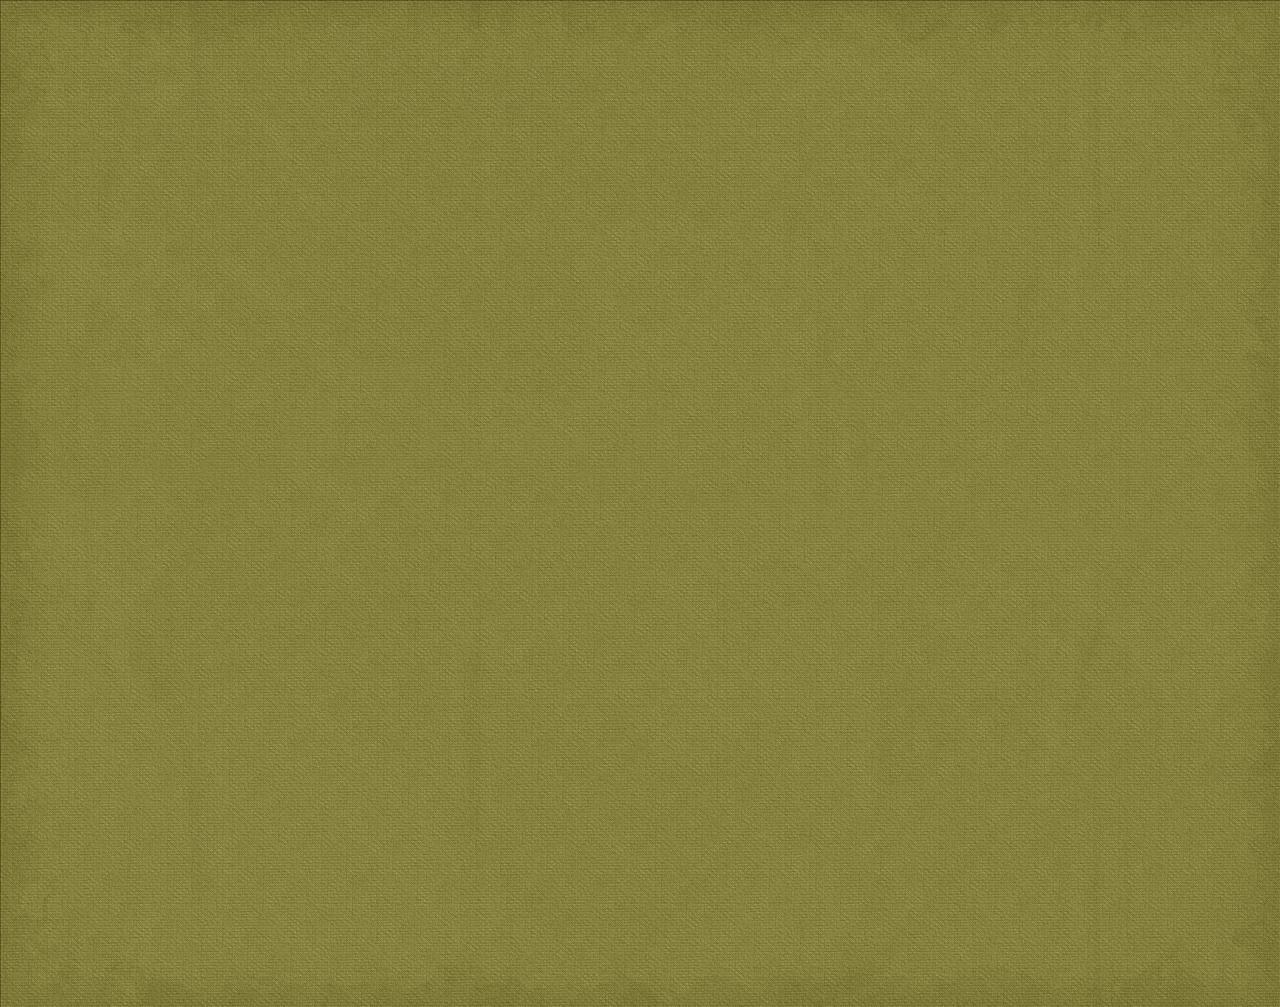 Olive Green Wallpaper 1280x1007